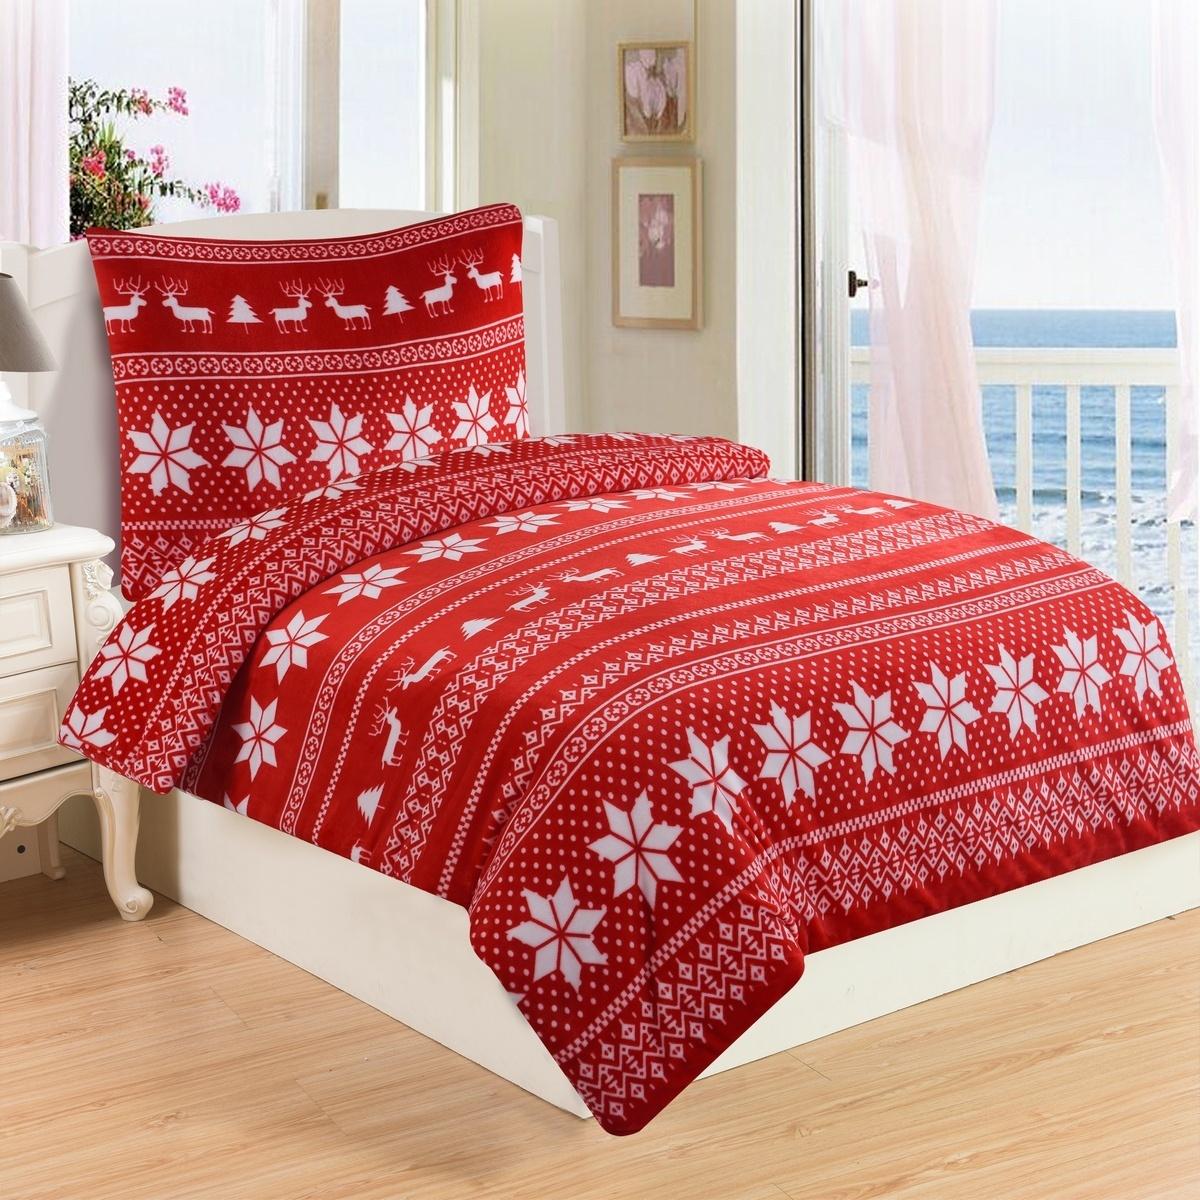 Jahu Obliečky mikroplyš Winter červená, 220 x 200 cm, 2 ks 70 x 90 cm